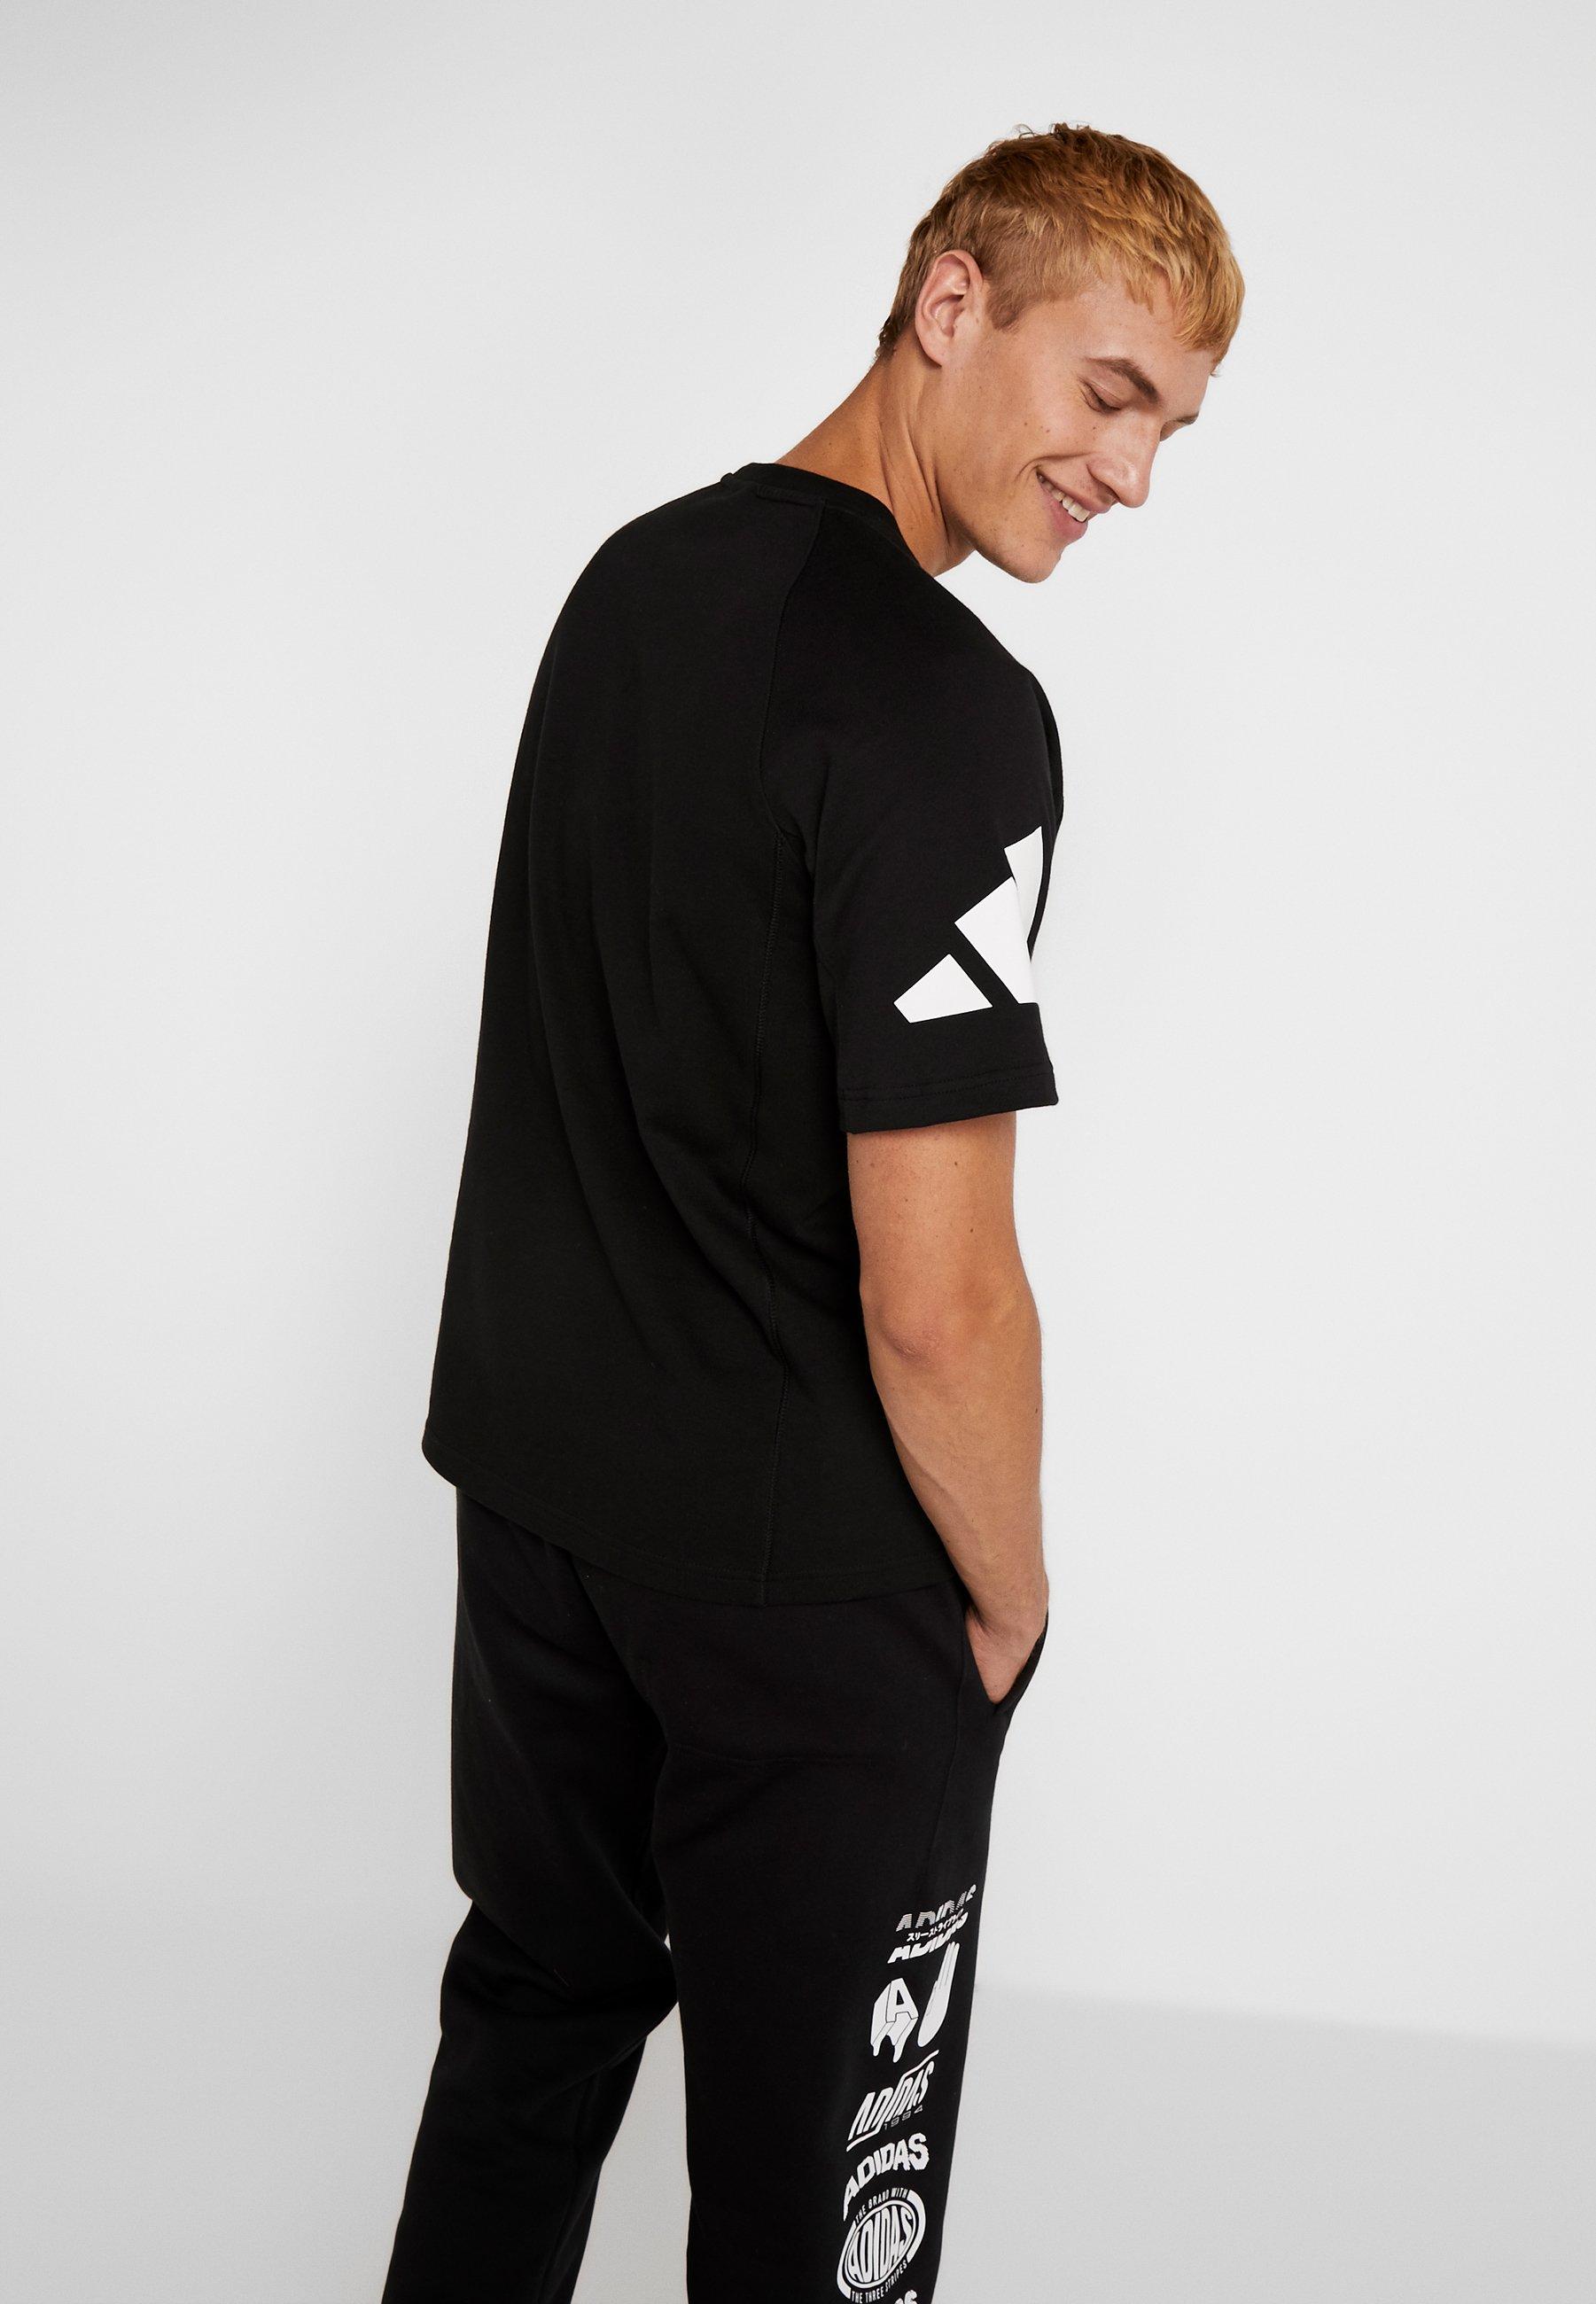 Con Adidas Stampa Heavy TeeT shirt Black Performance 0On8kZNwPX